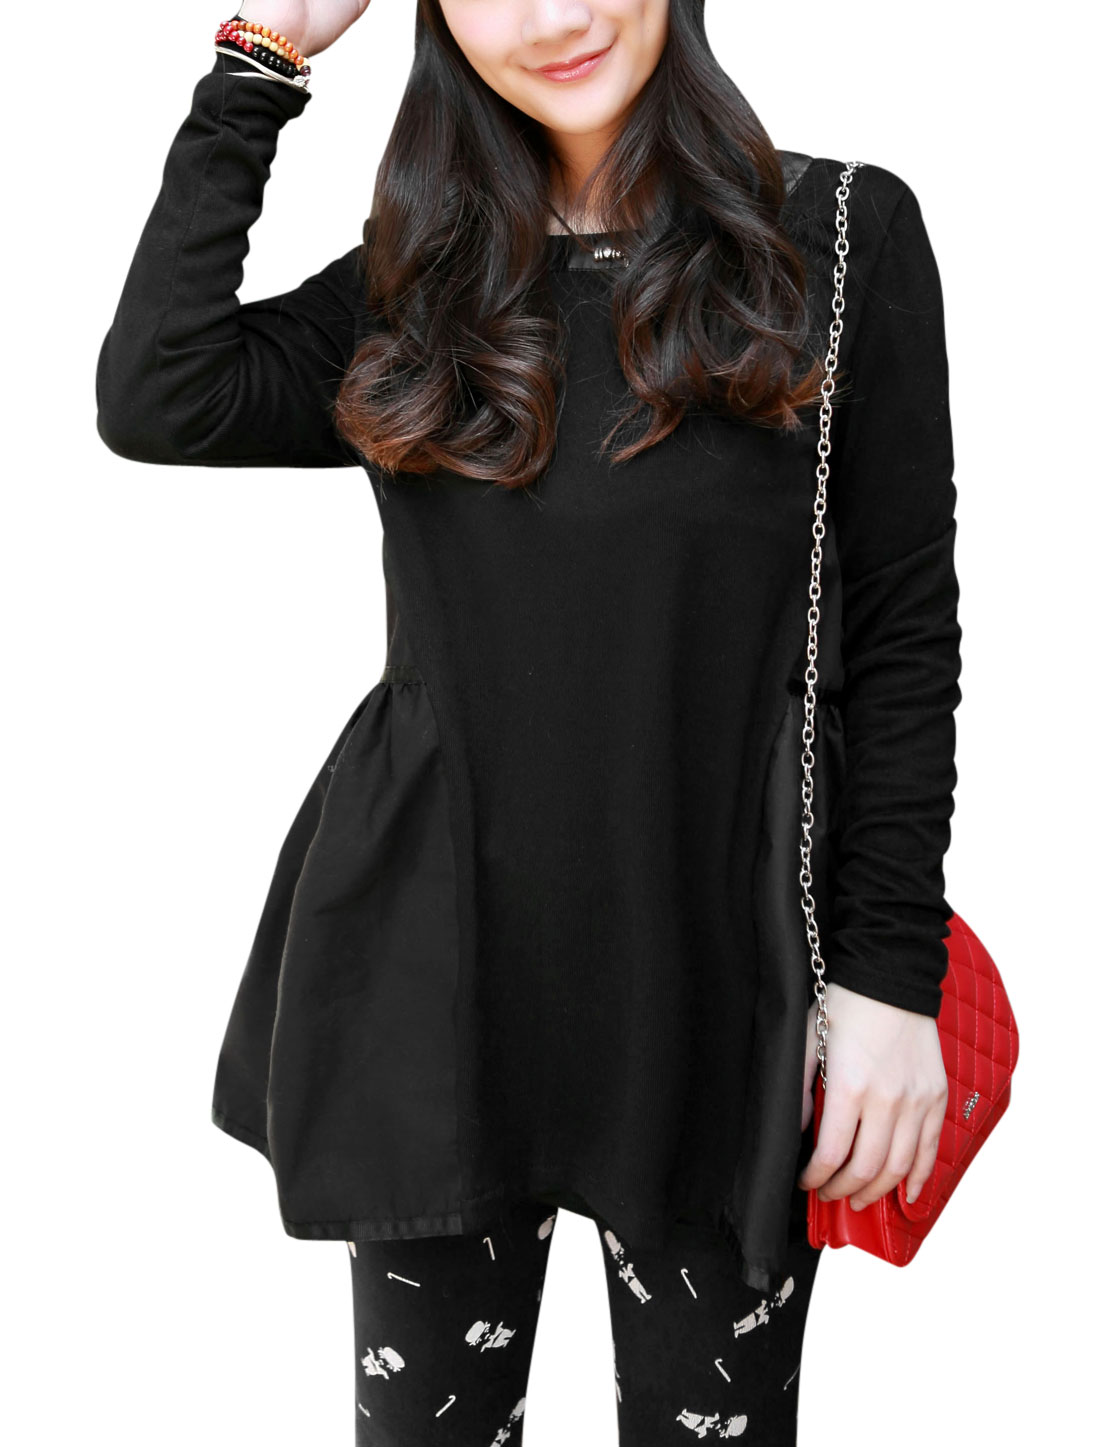 Maternity Slipover Panel Design Cozy Fit Top Shirt Black L